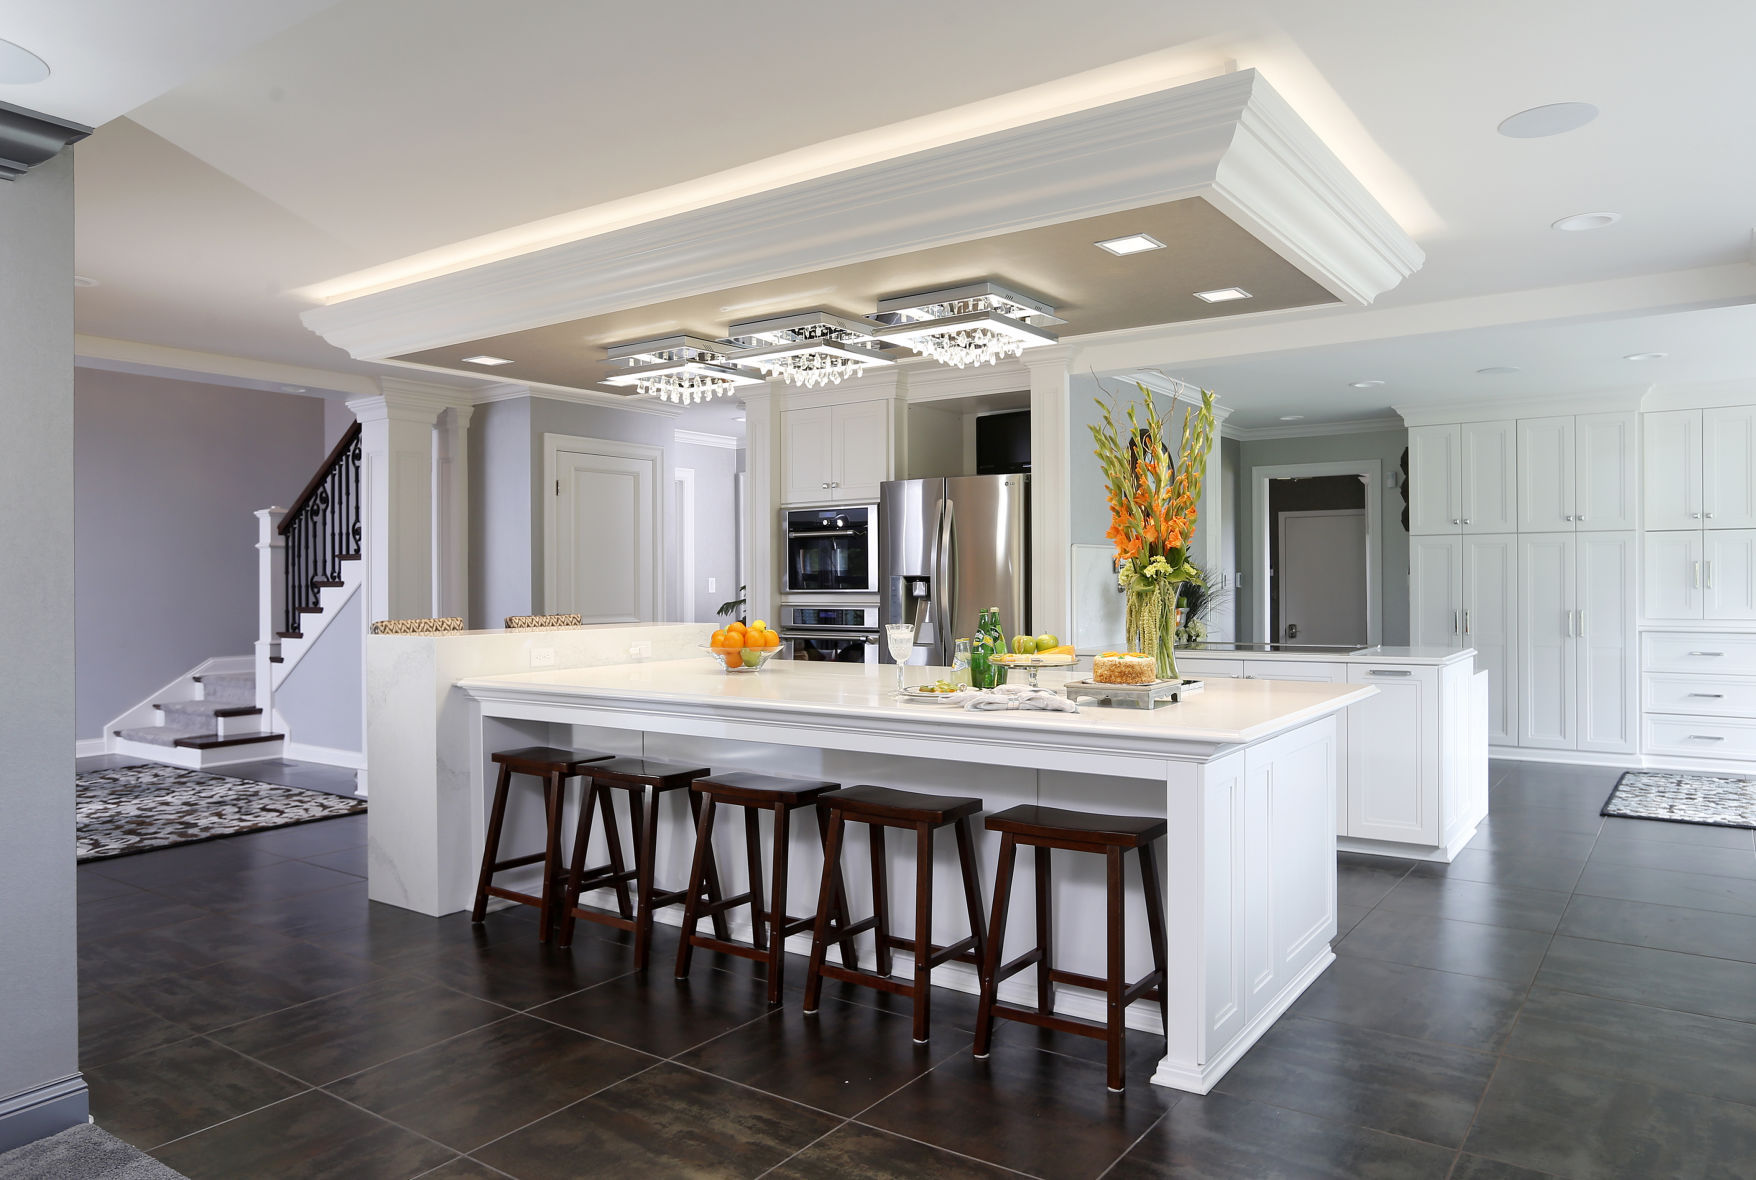 062117bp gallery of homes 27 Kathy Flack ASID Registered Interior Designer